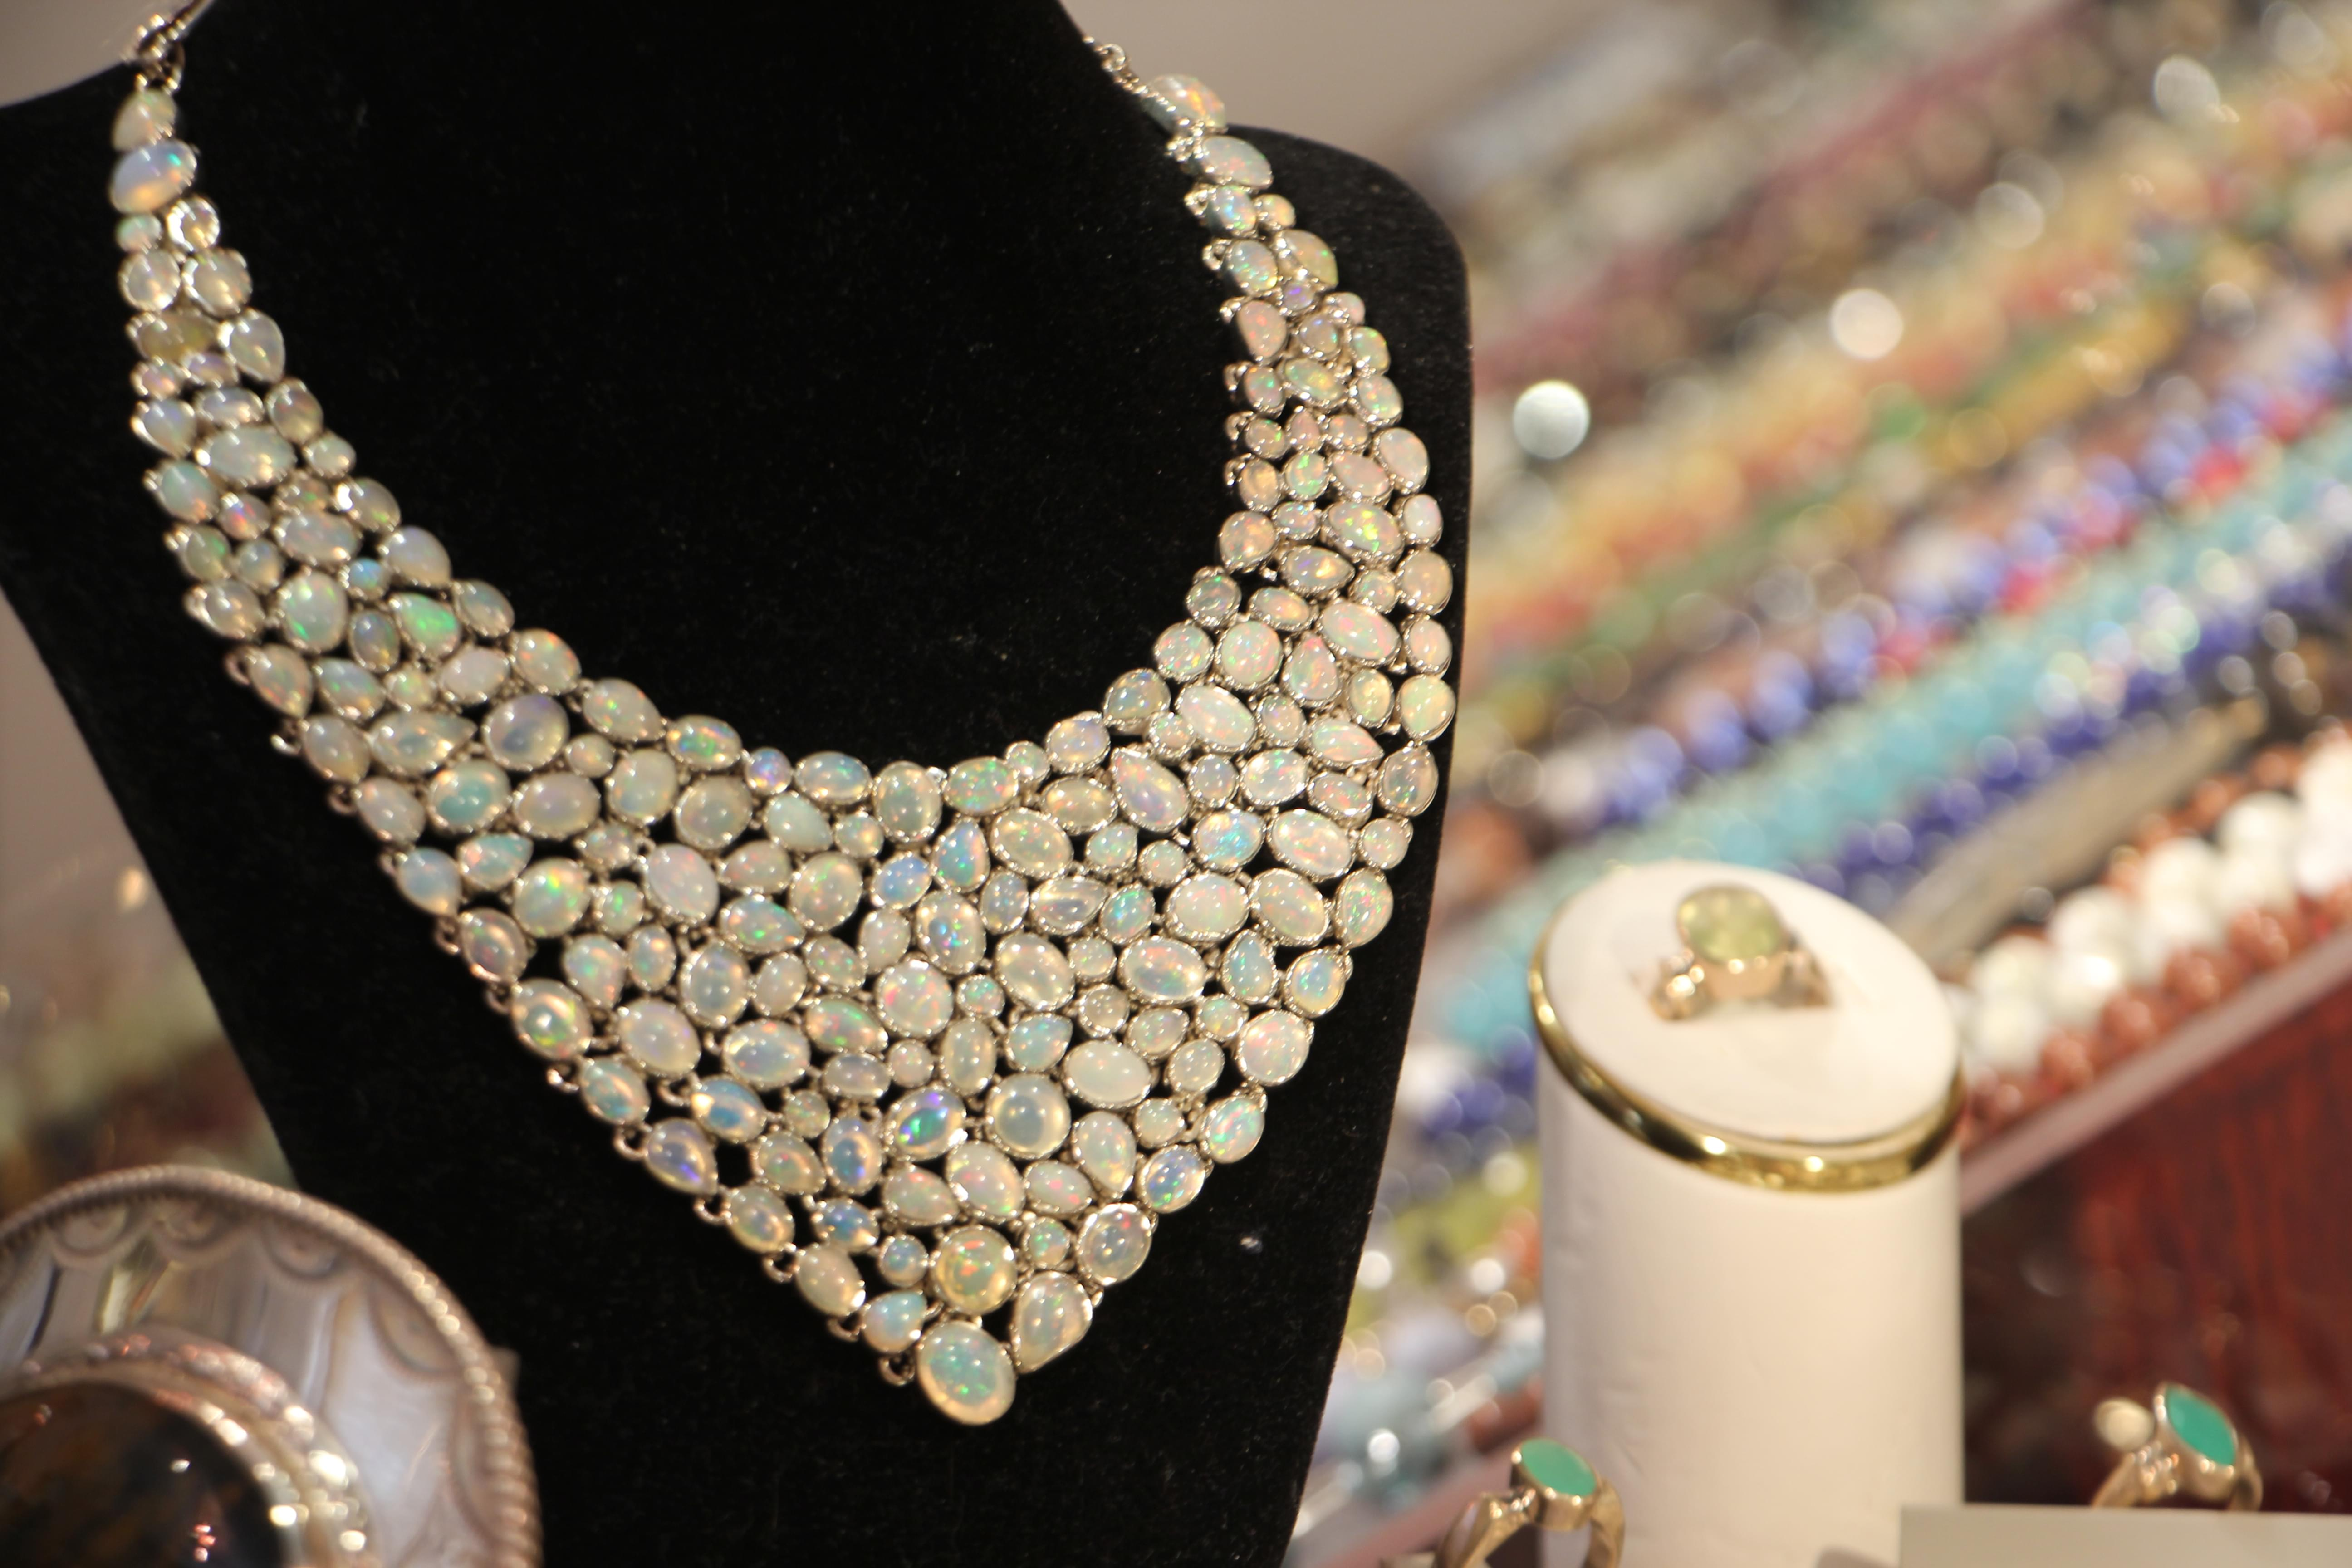 Tomorrow's Heirlooms Princeton NJ necklace